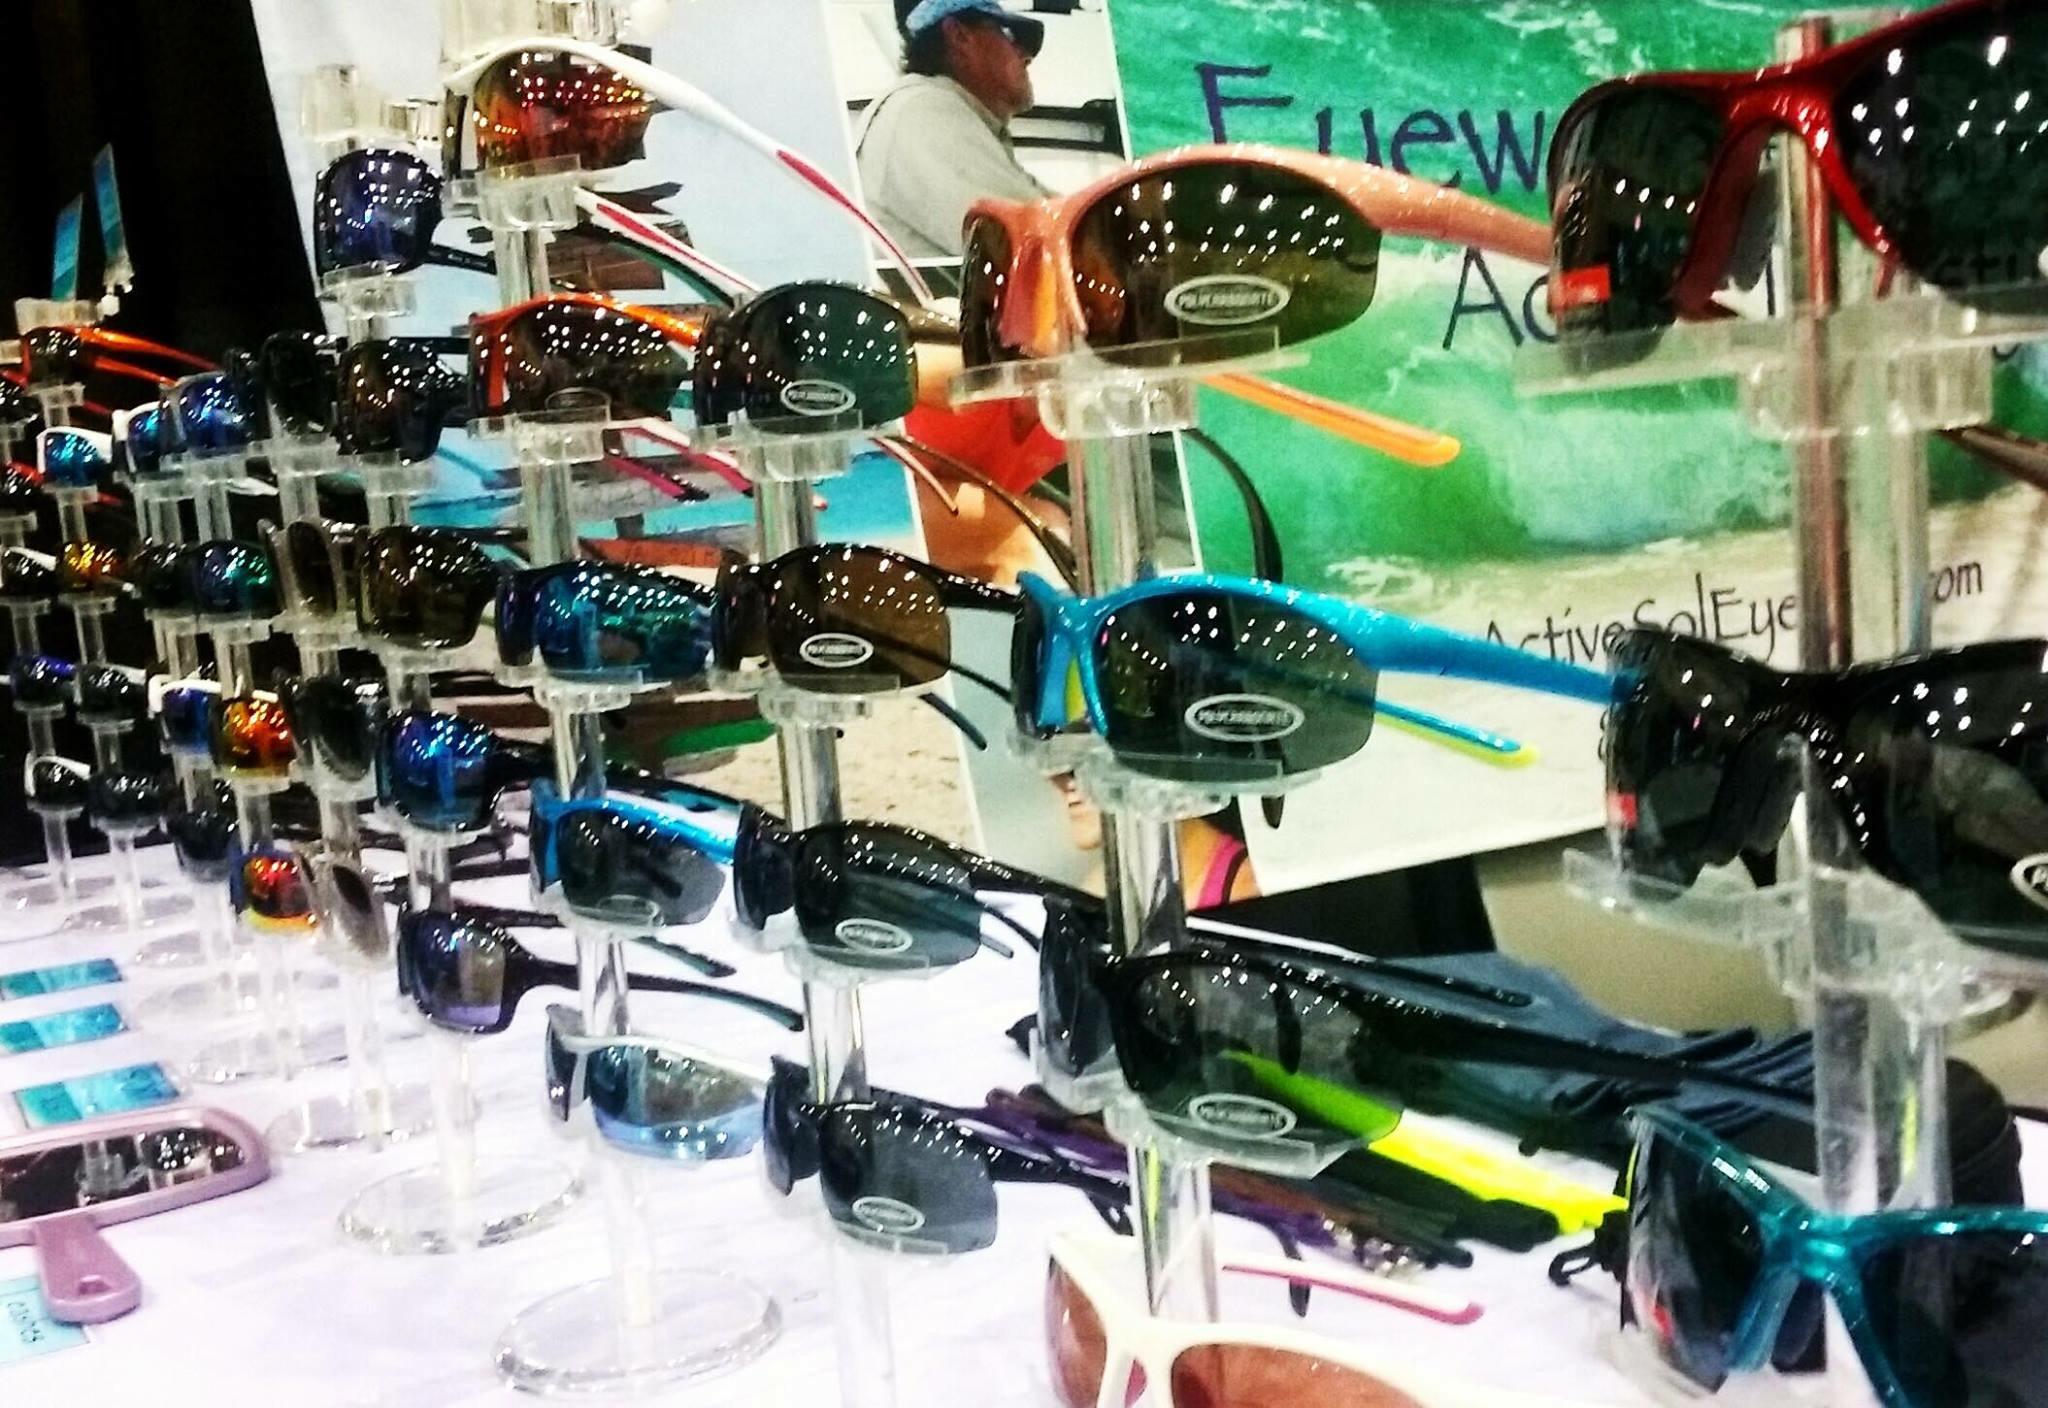 Active Sol Eyewear